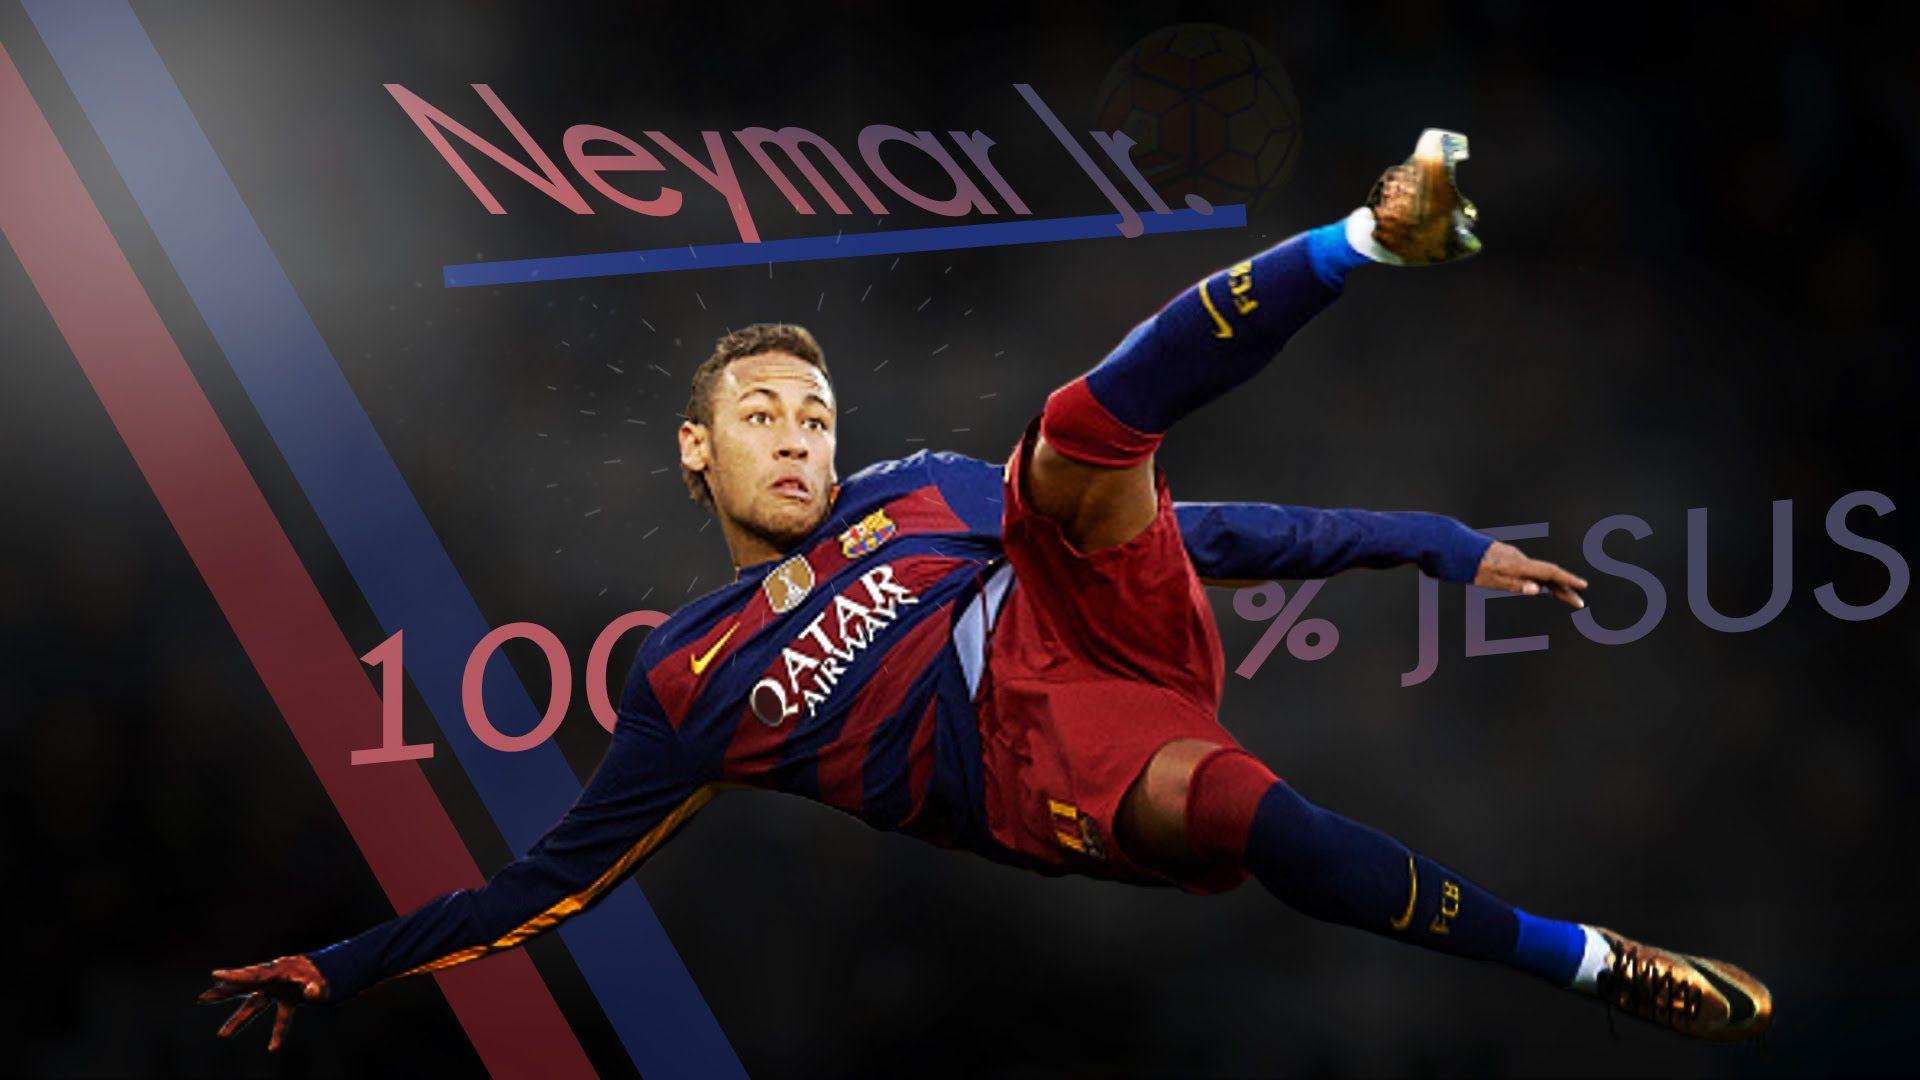 Neymar Jr HD Images 3 whb #NeymarJrHDImages #NeymarJr #Neymar #football # soccer